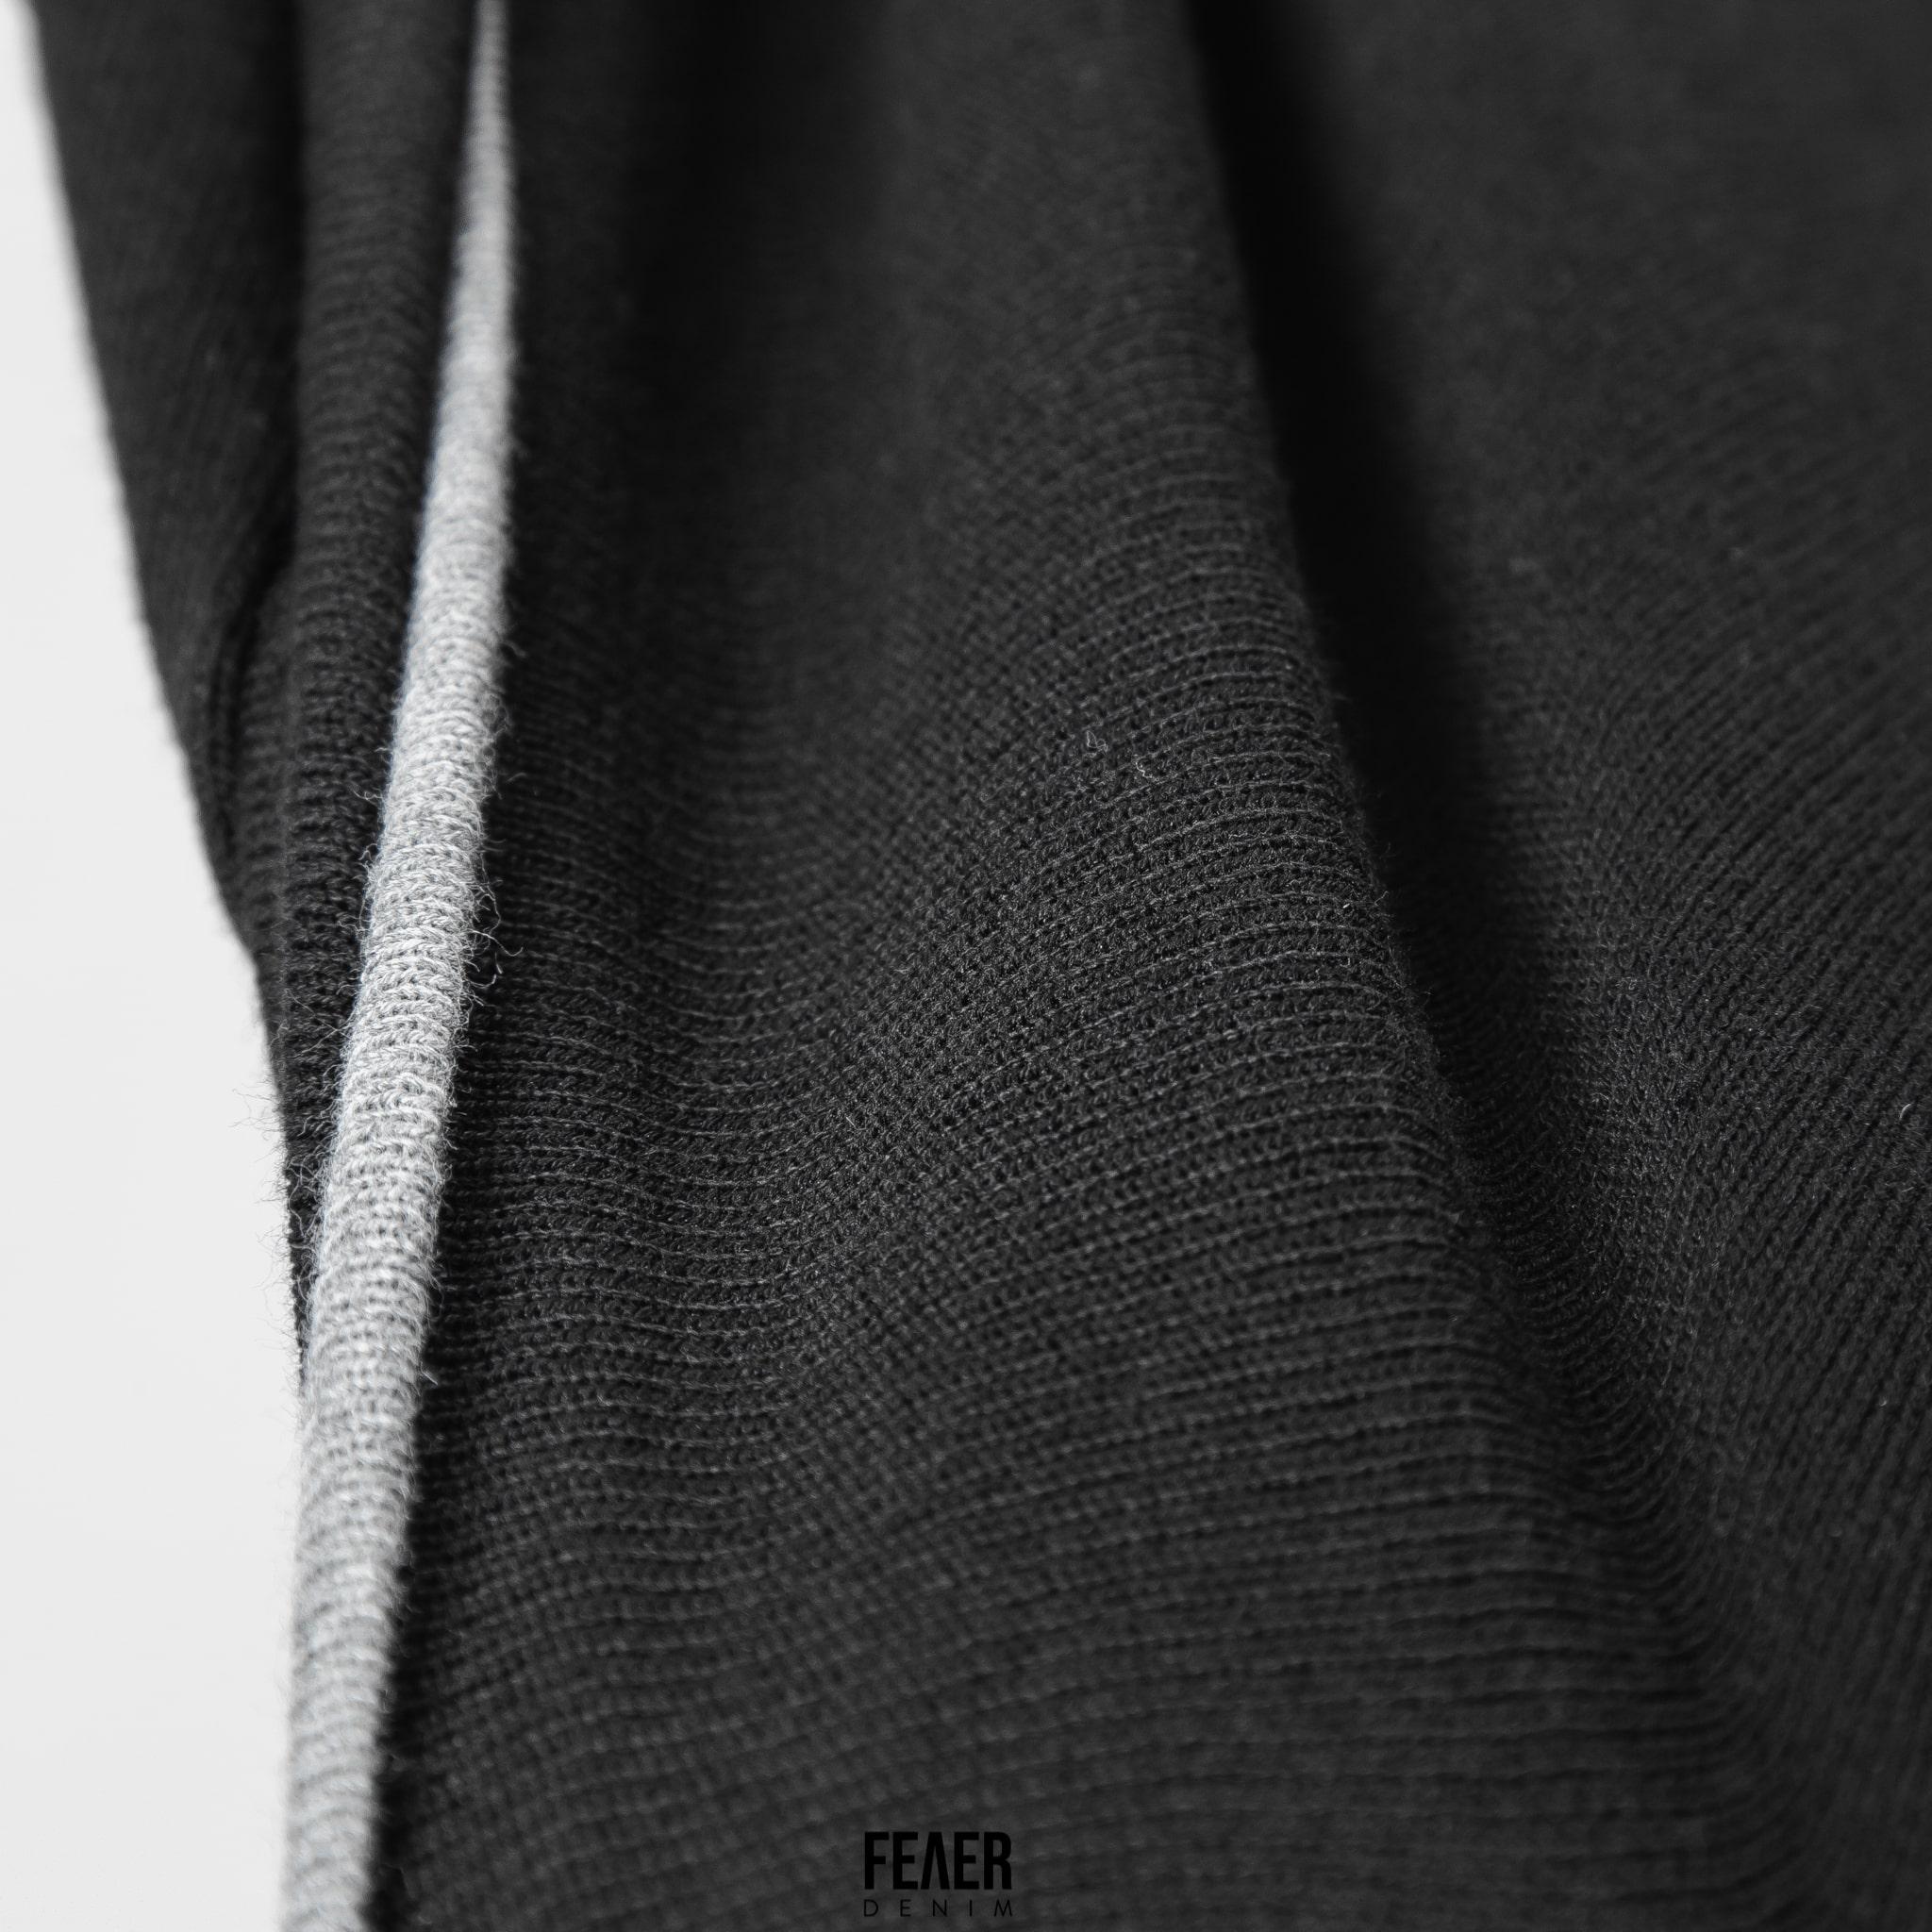 SP206 - Áo Dệt Kim Knitted Romano